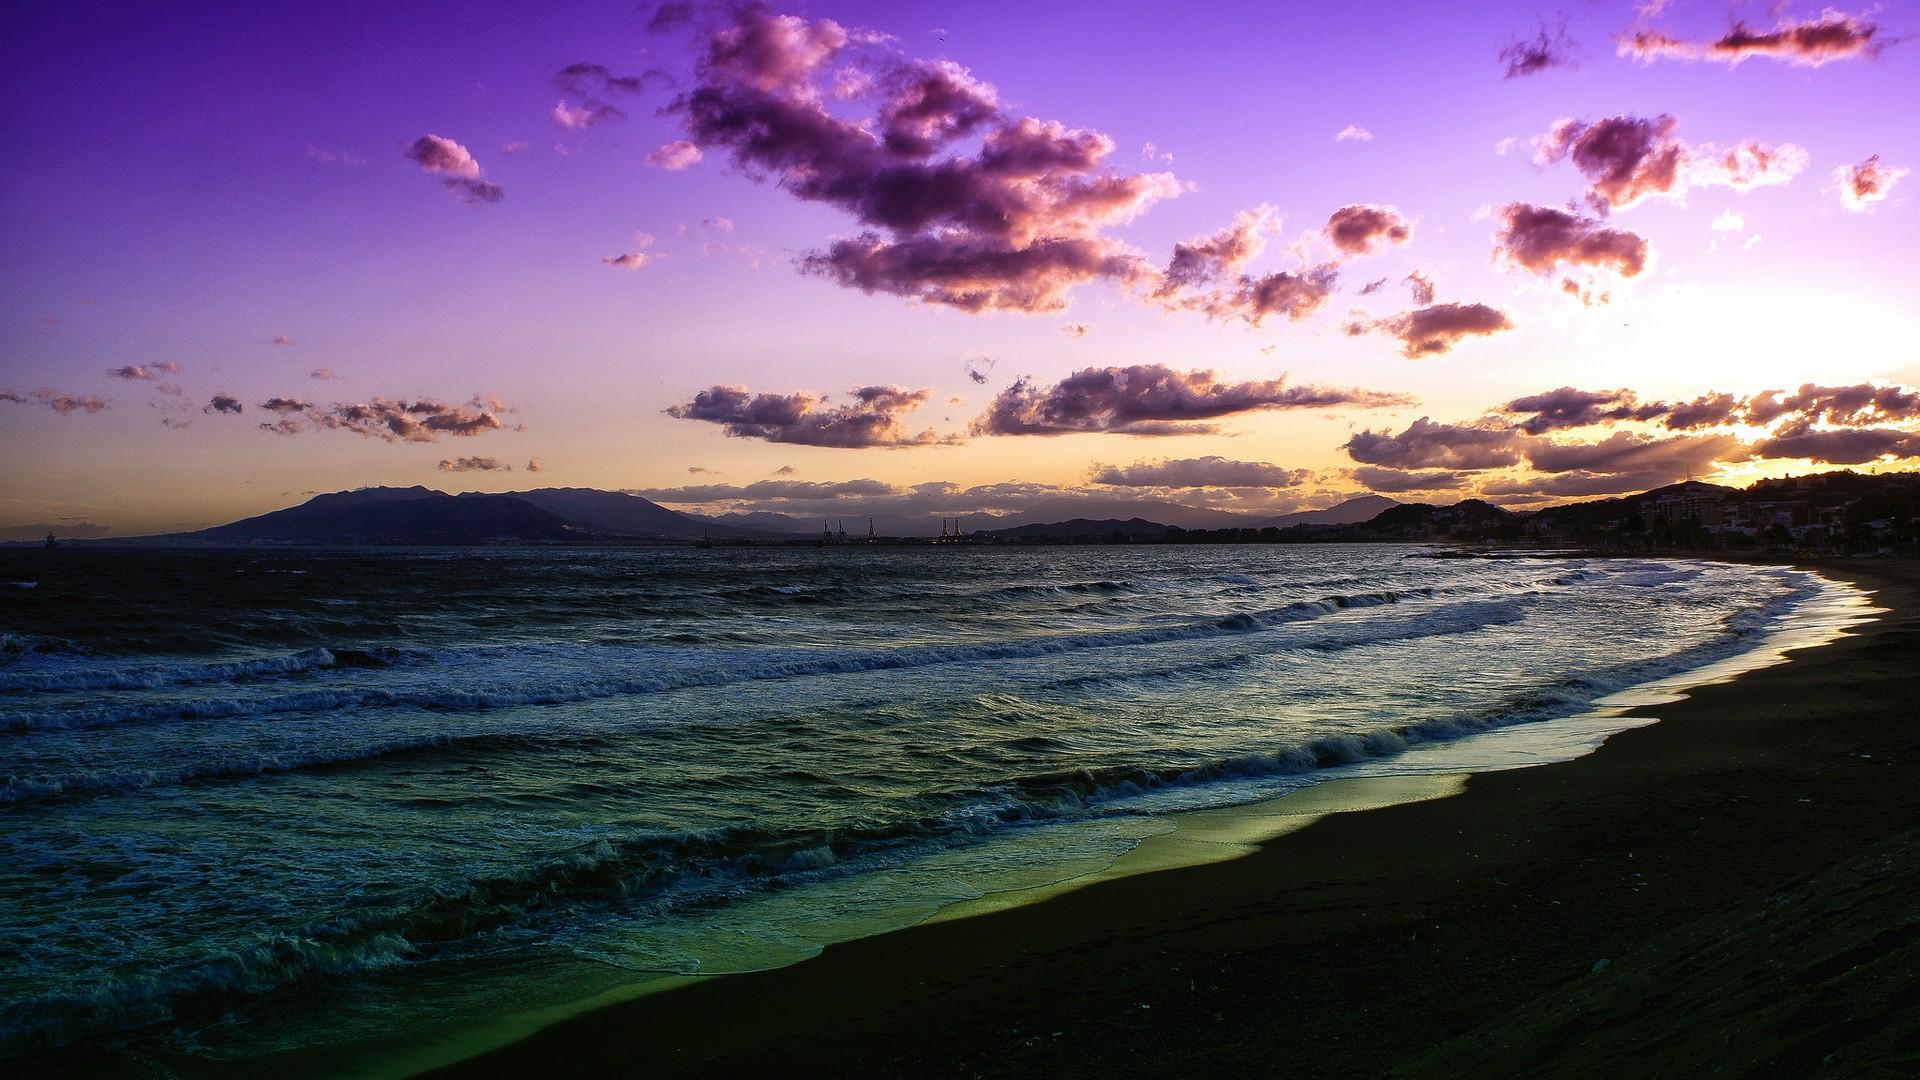 Purple Sunset Wallpaper Picture